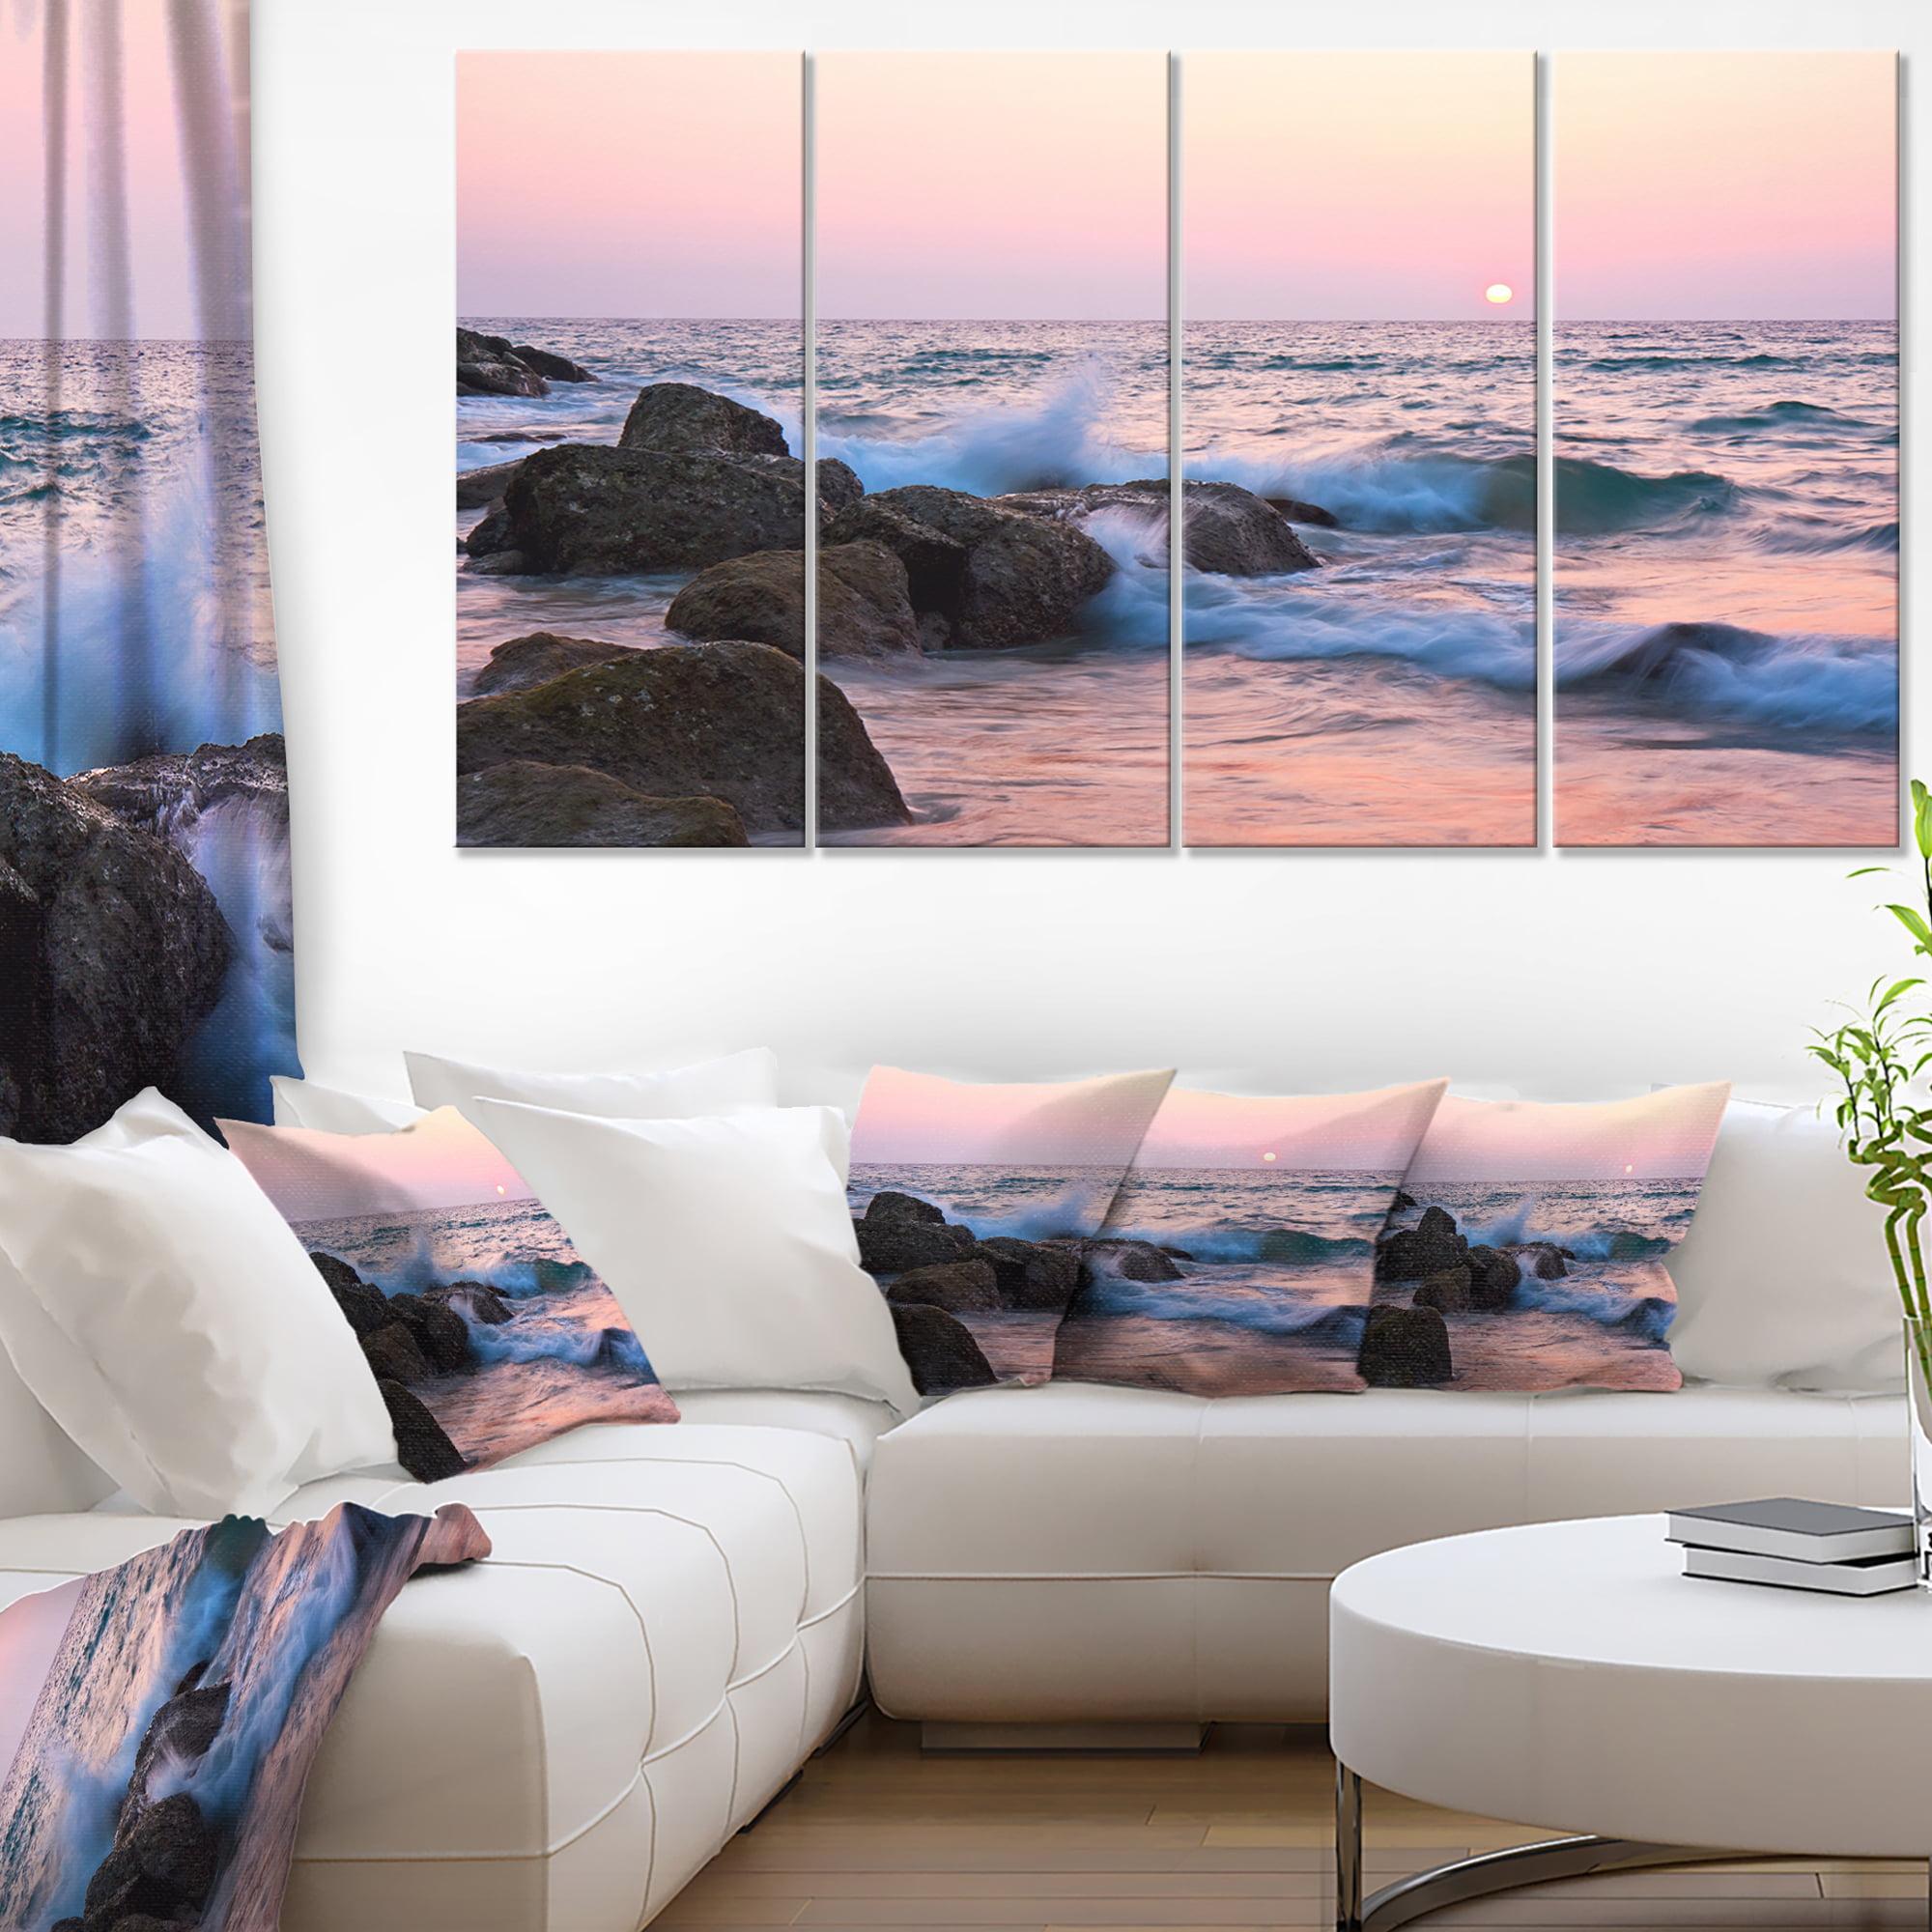 Rocky Coast with Foam Waves - Large Seashore Canvas Print - image 2 de 3